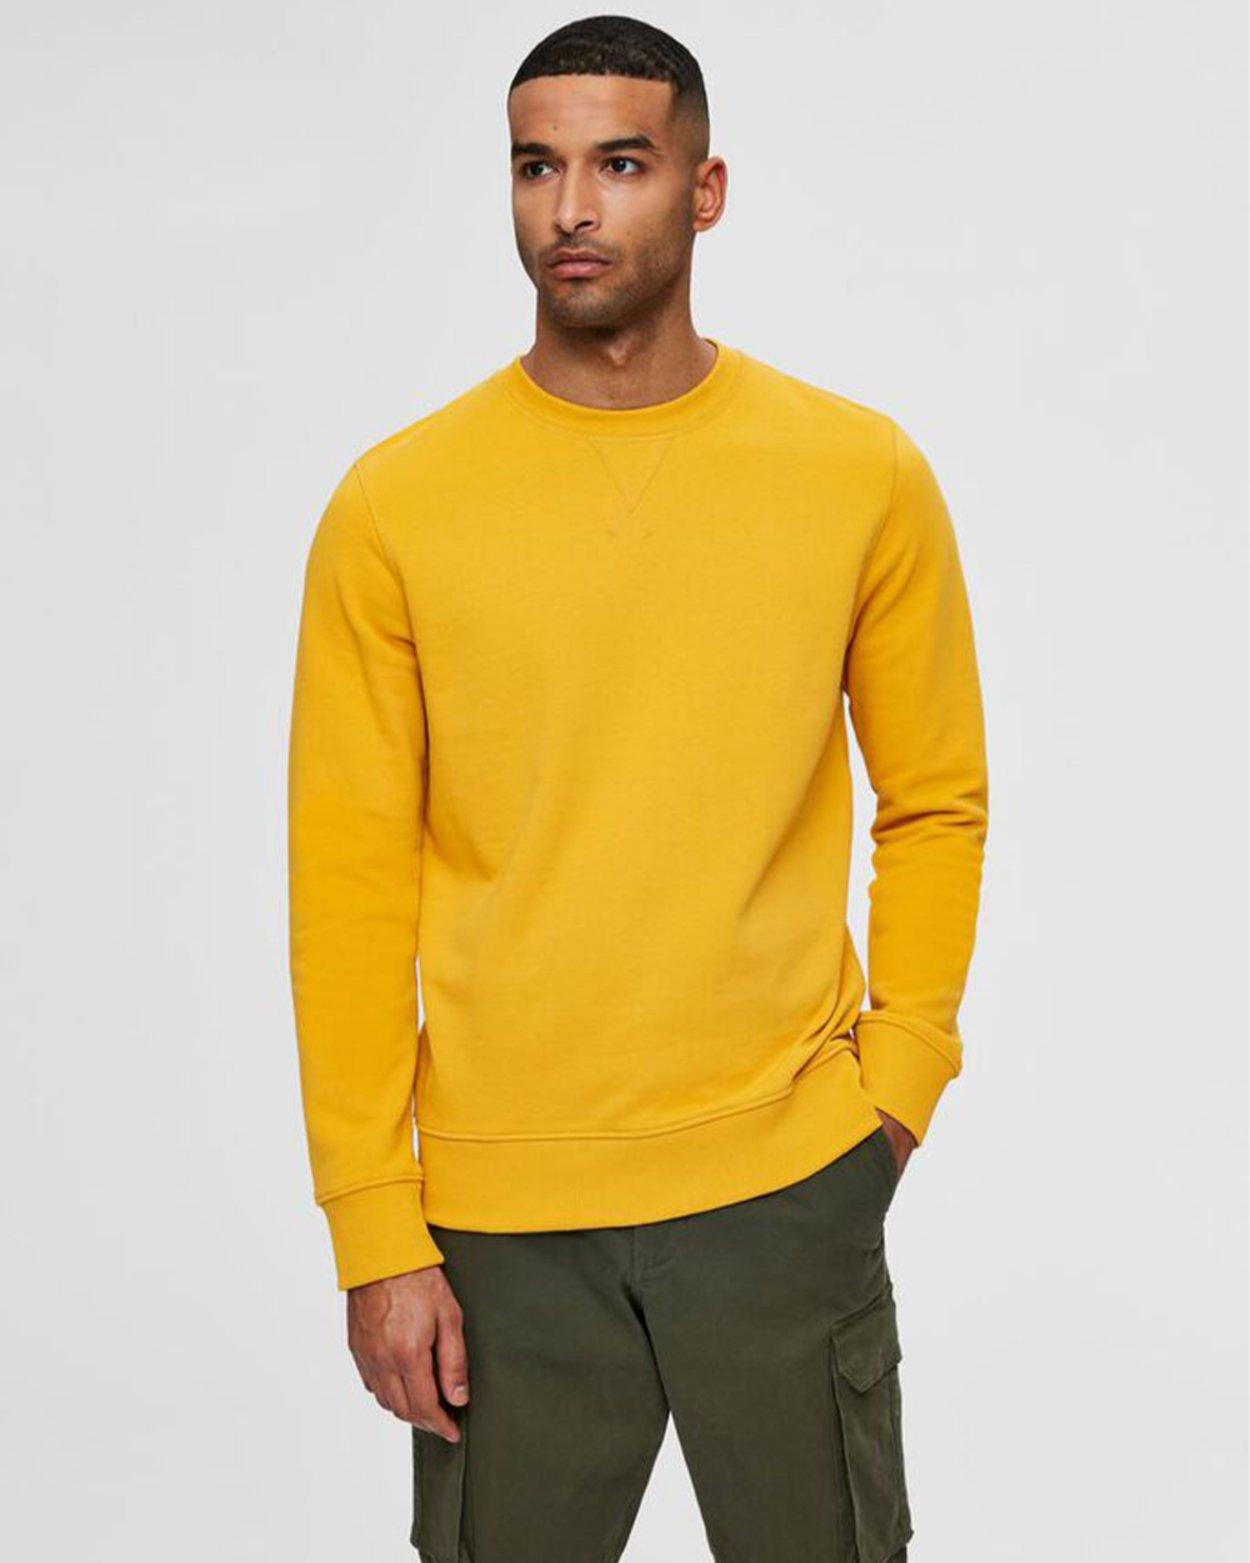 Jason Crew Neck Sweater